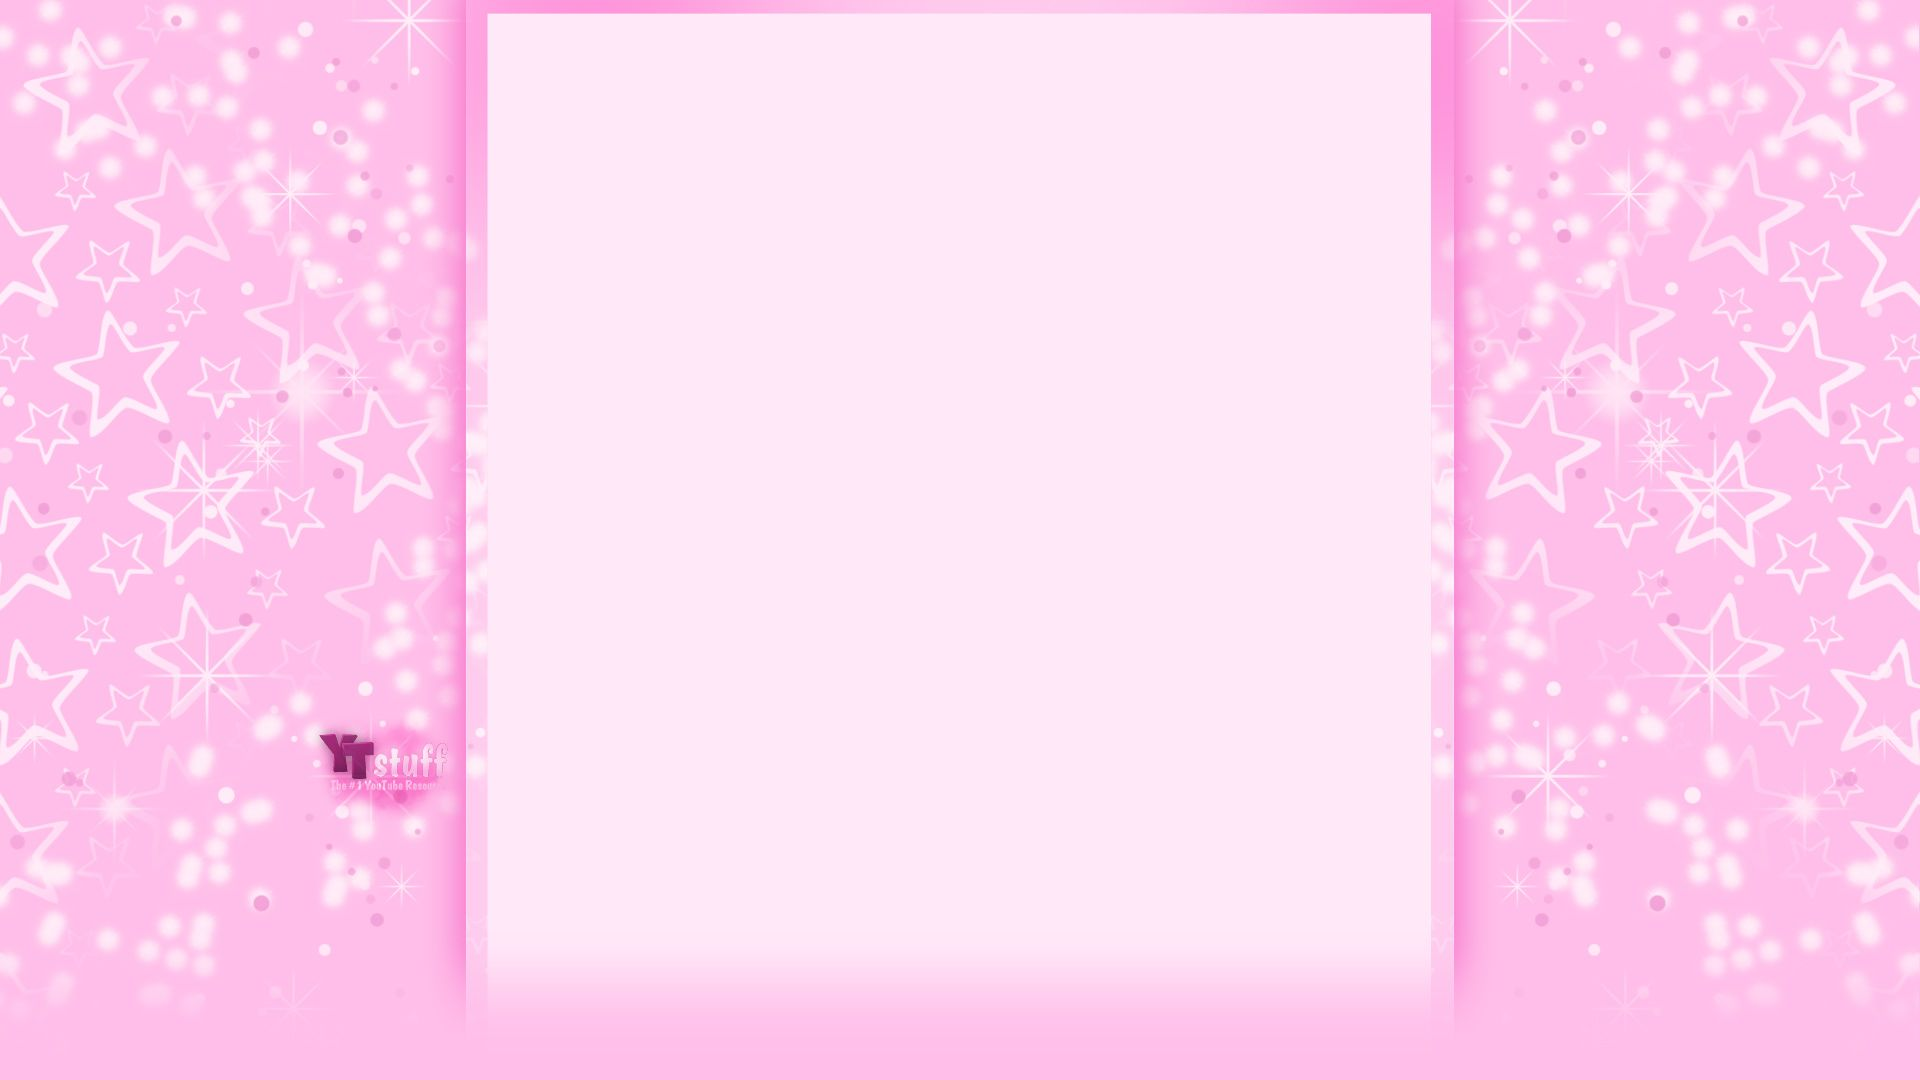 Cute Wallpaper for YouTube - WallpaperSafari Girly Blog Youtube